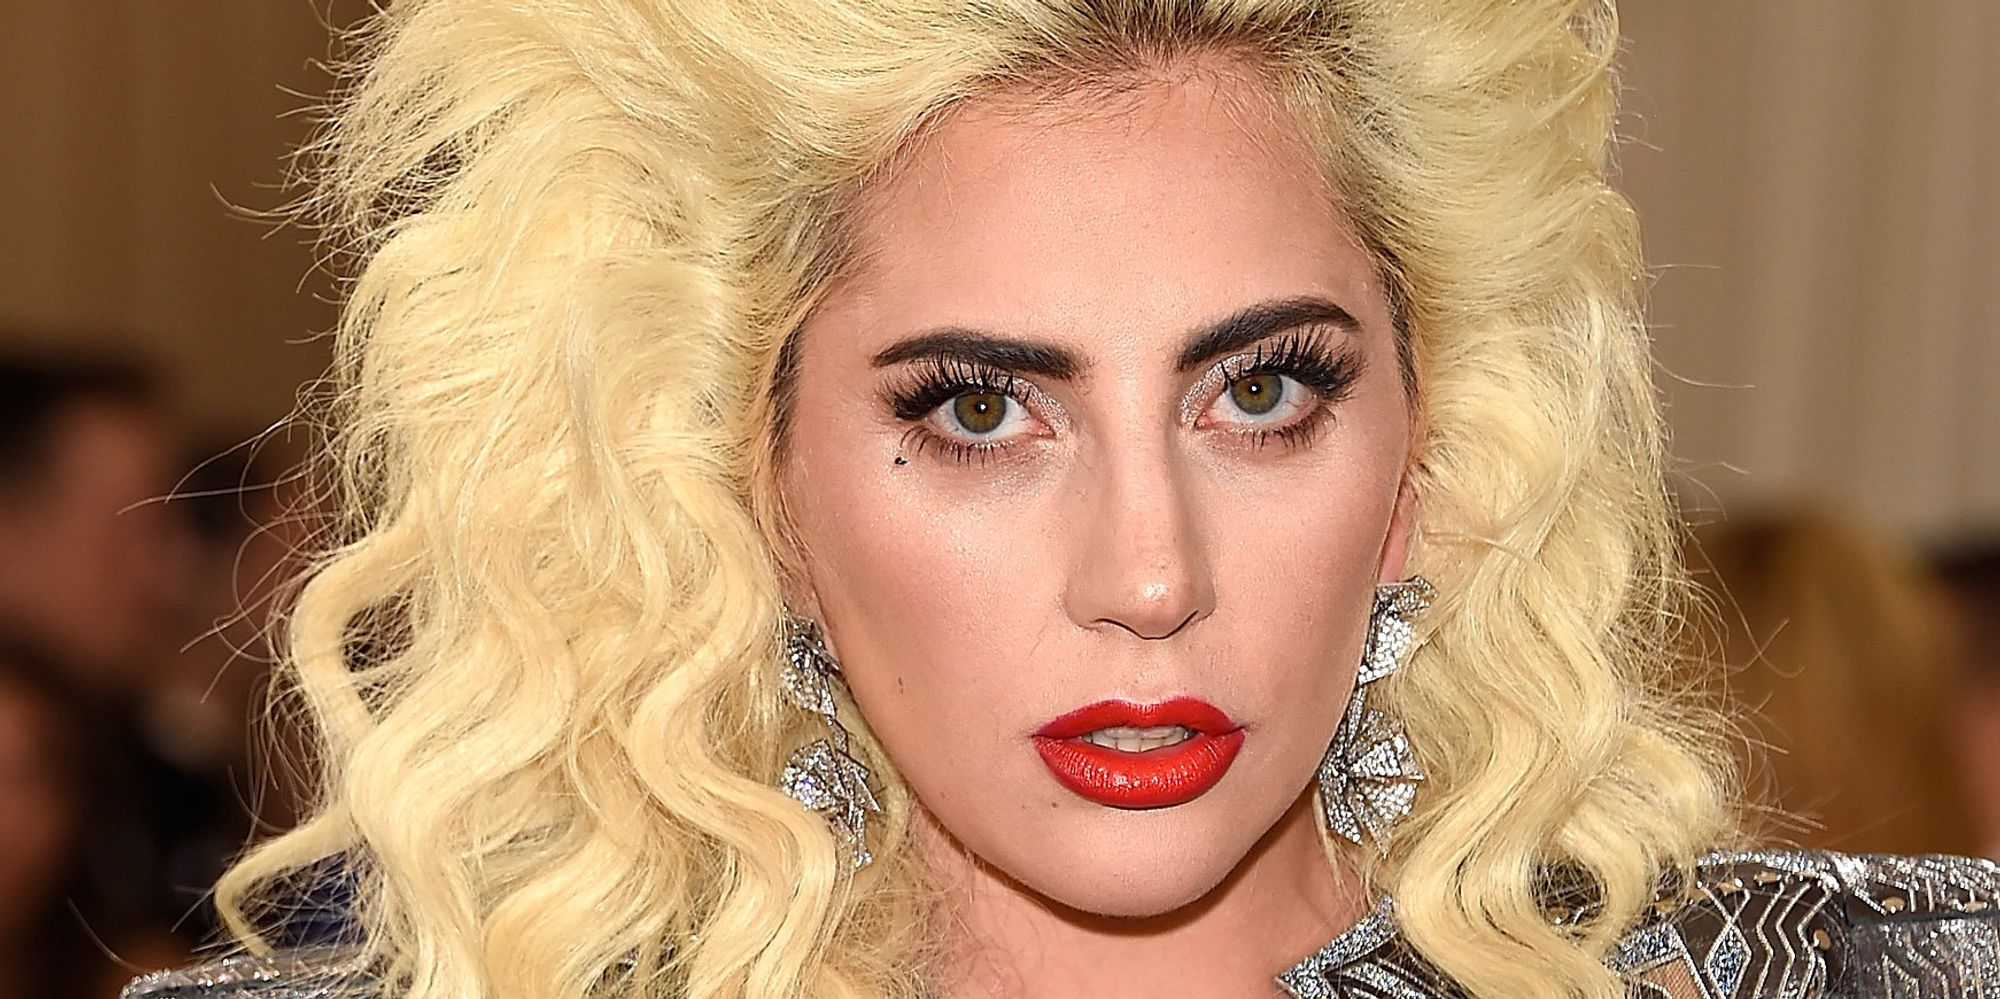 Lady Gaga: Lady Gaga Goes Pantless In Circuit-Board Leotard At The